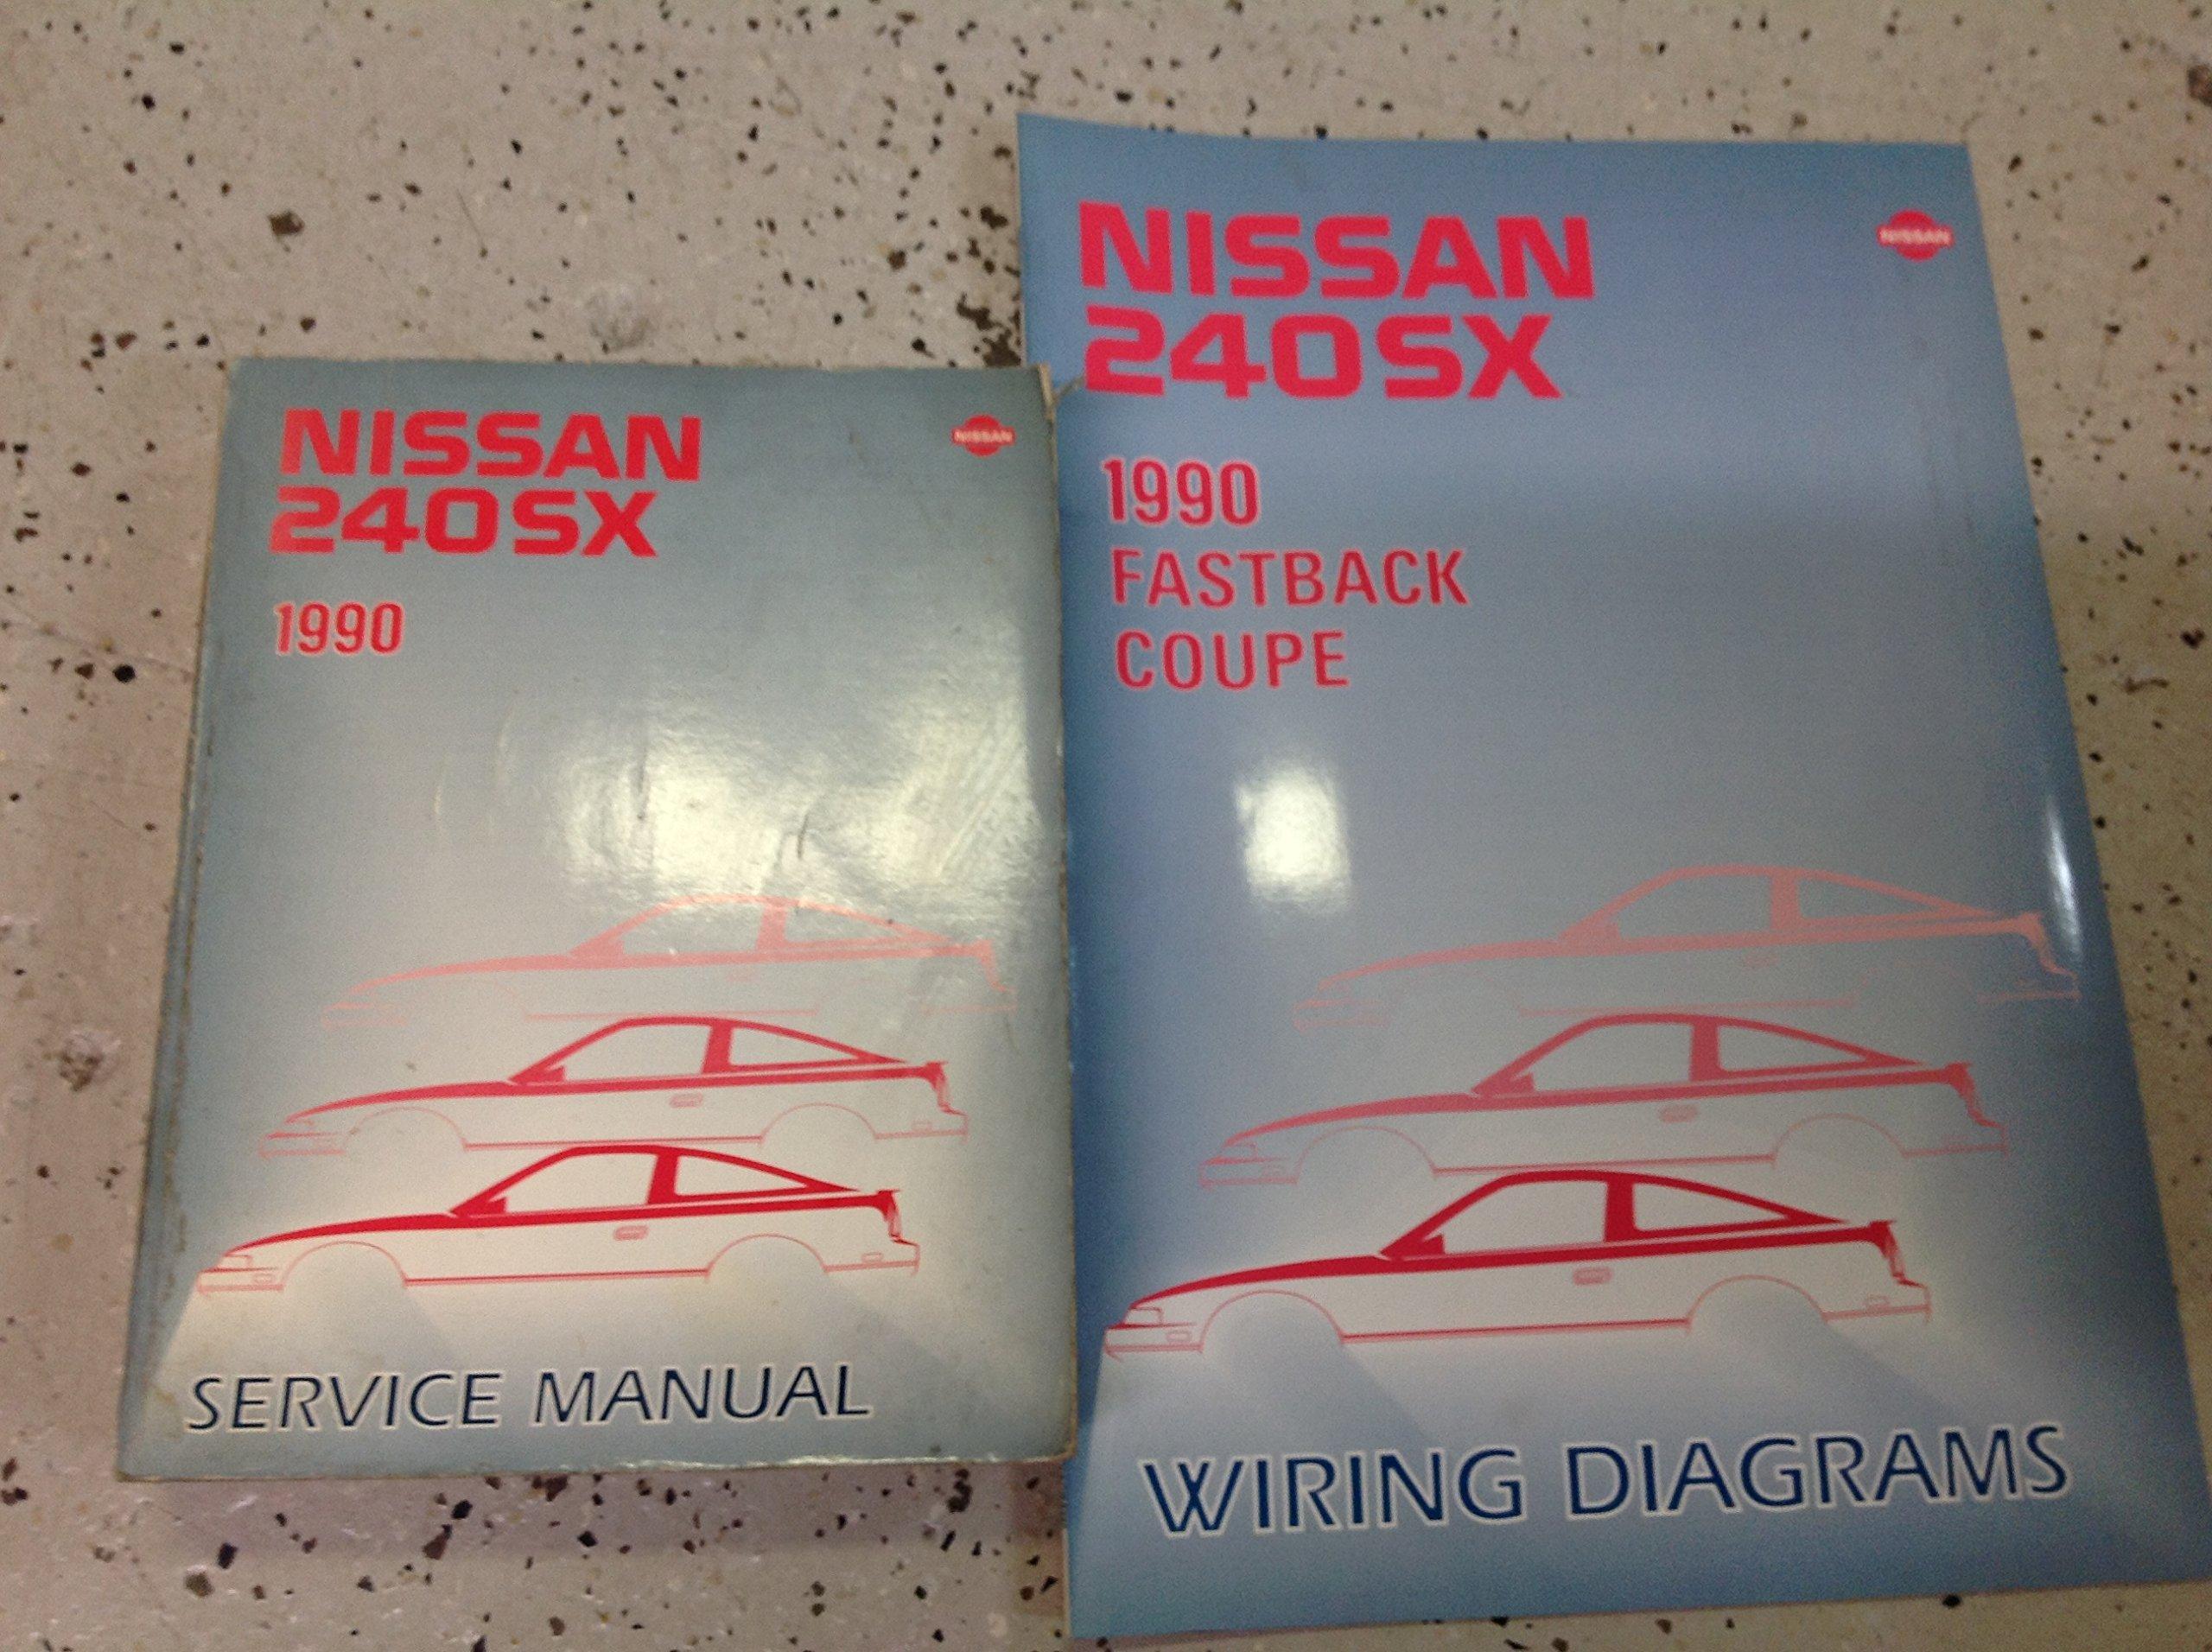 1990 Nissan 240sx Service Repair Shop Manual Factory Oem W Wiring Diagram Electrical Ewd Books